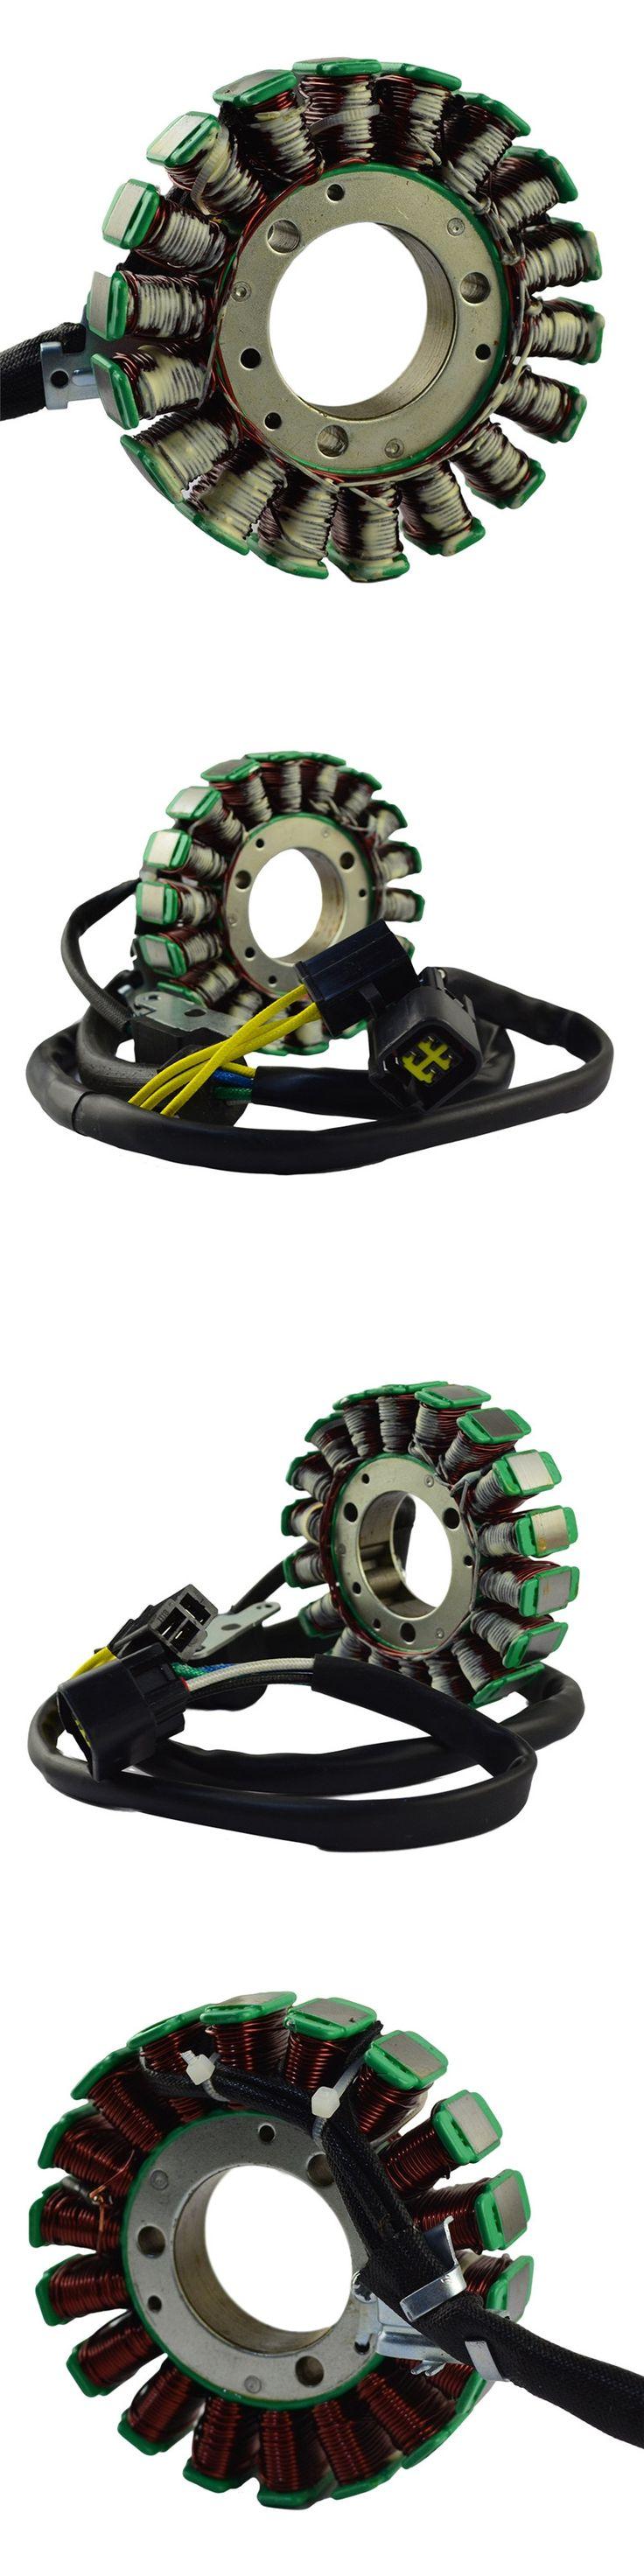 Motorcycle Generator Parts Stator Coil Comp For SUZUKI DRZ400 DRZ 400